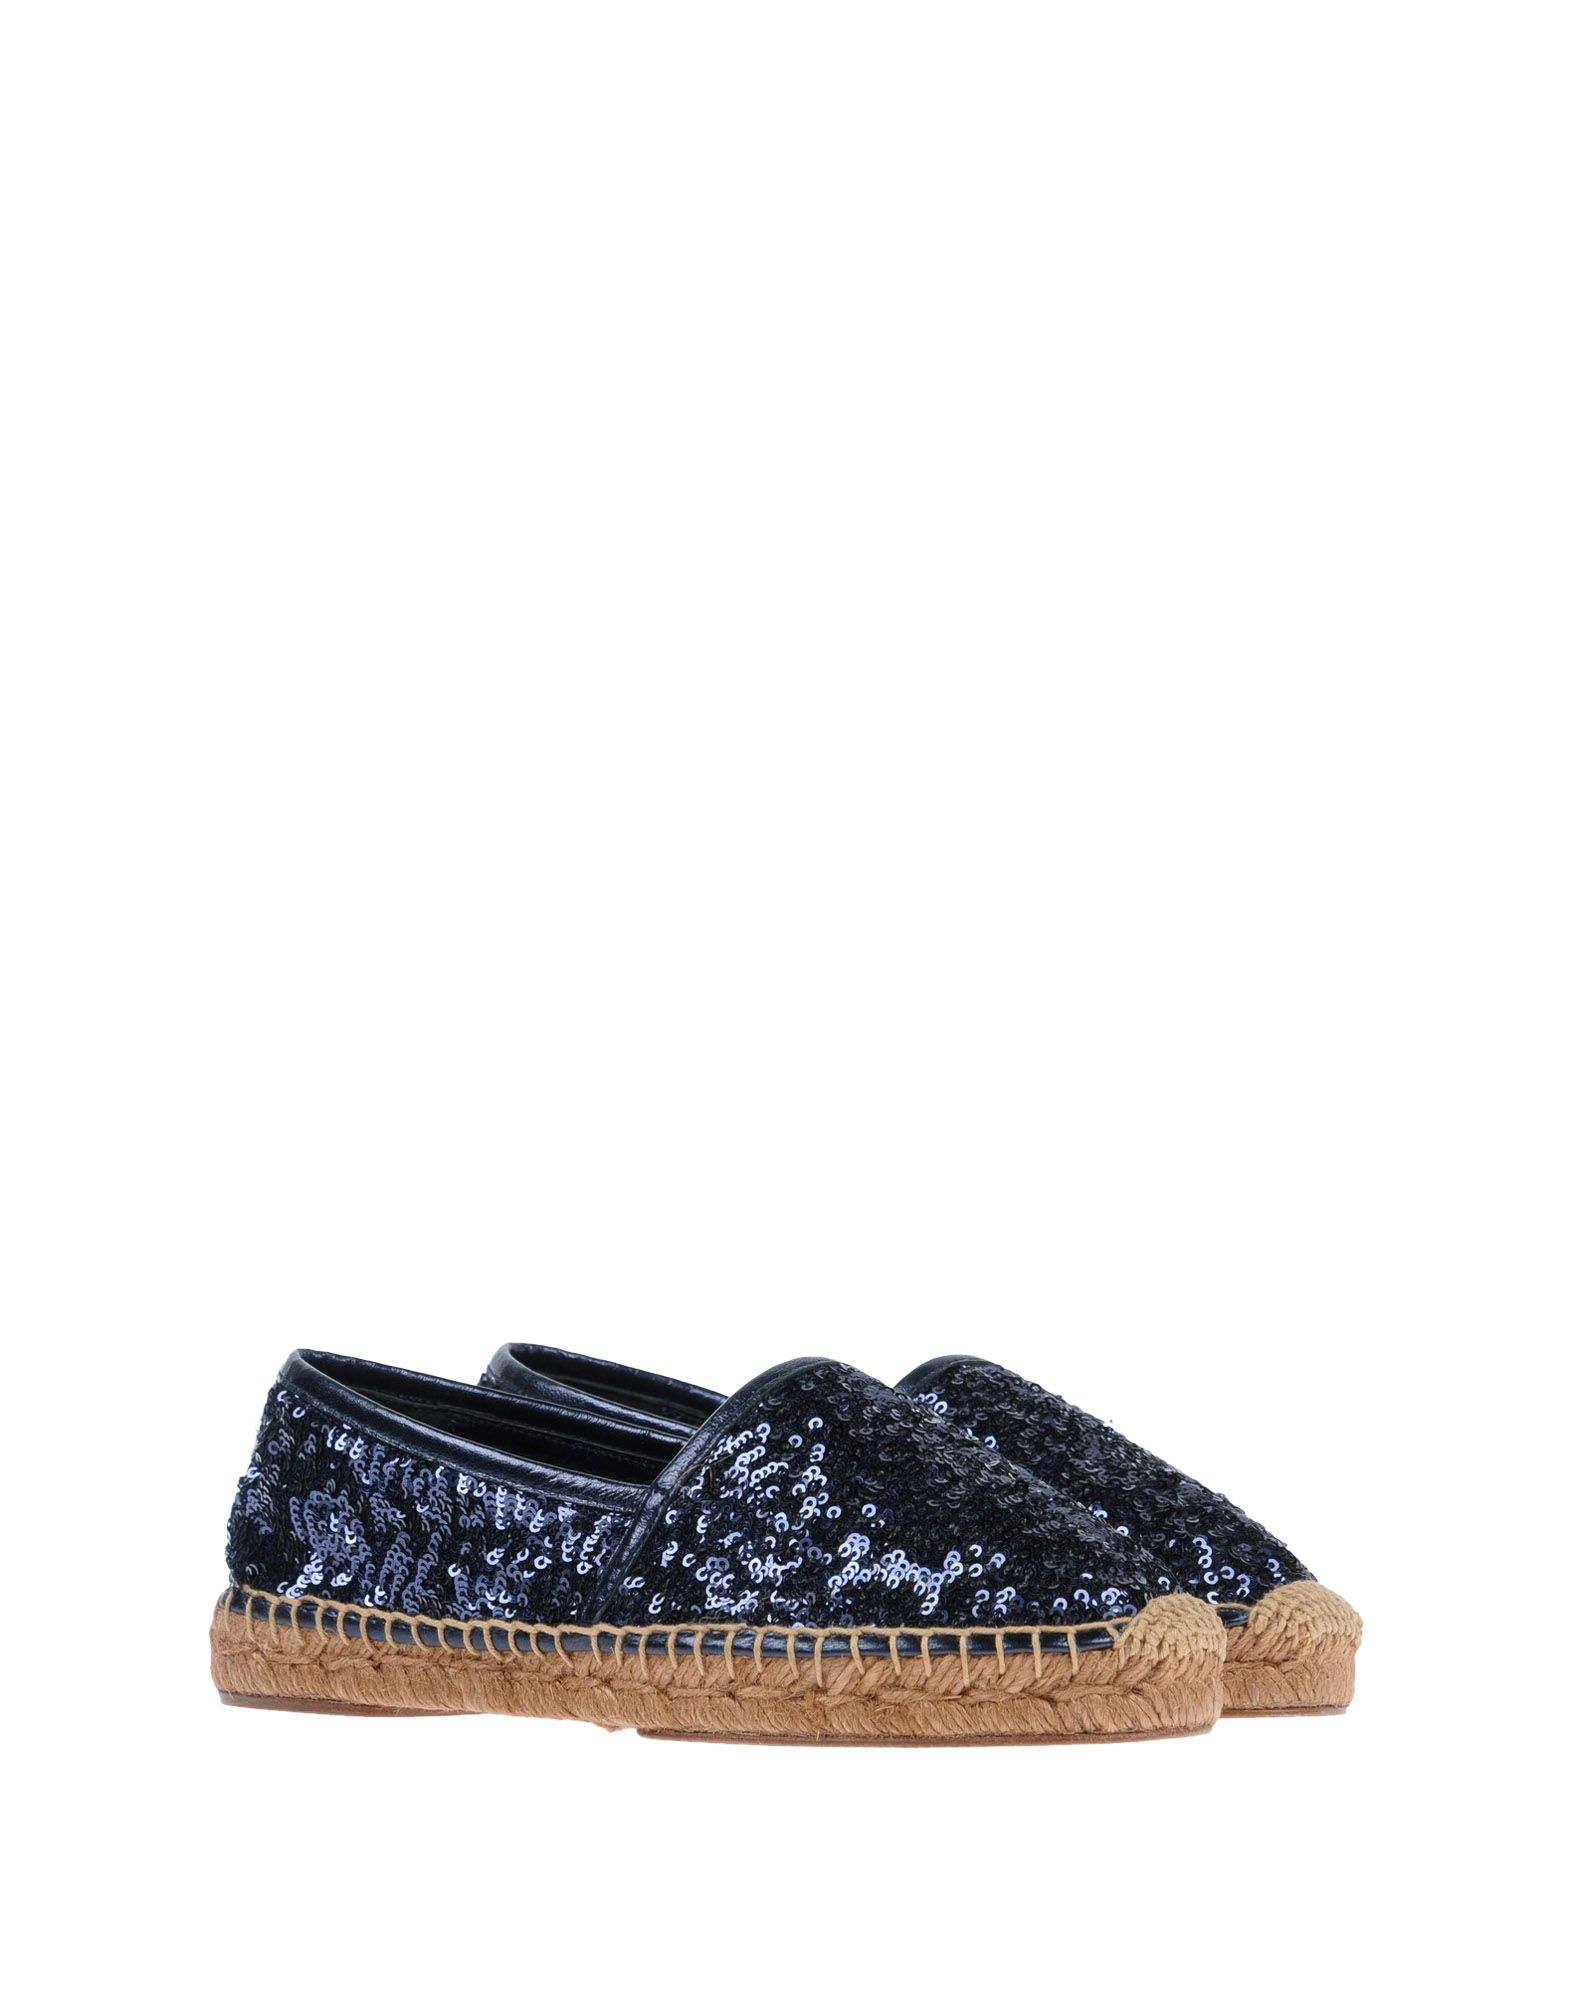 Stilvolle billige Schuhe Damen Dolce & Gabbana Espadrilles Damen Schuhe  11232330EC afb2ae